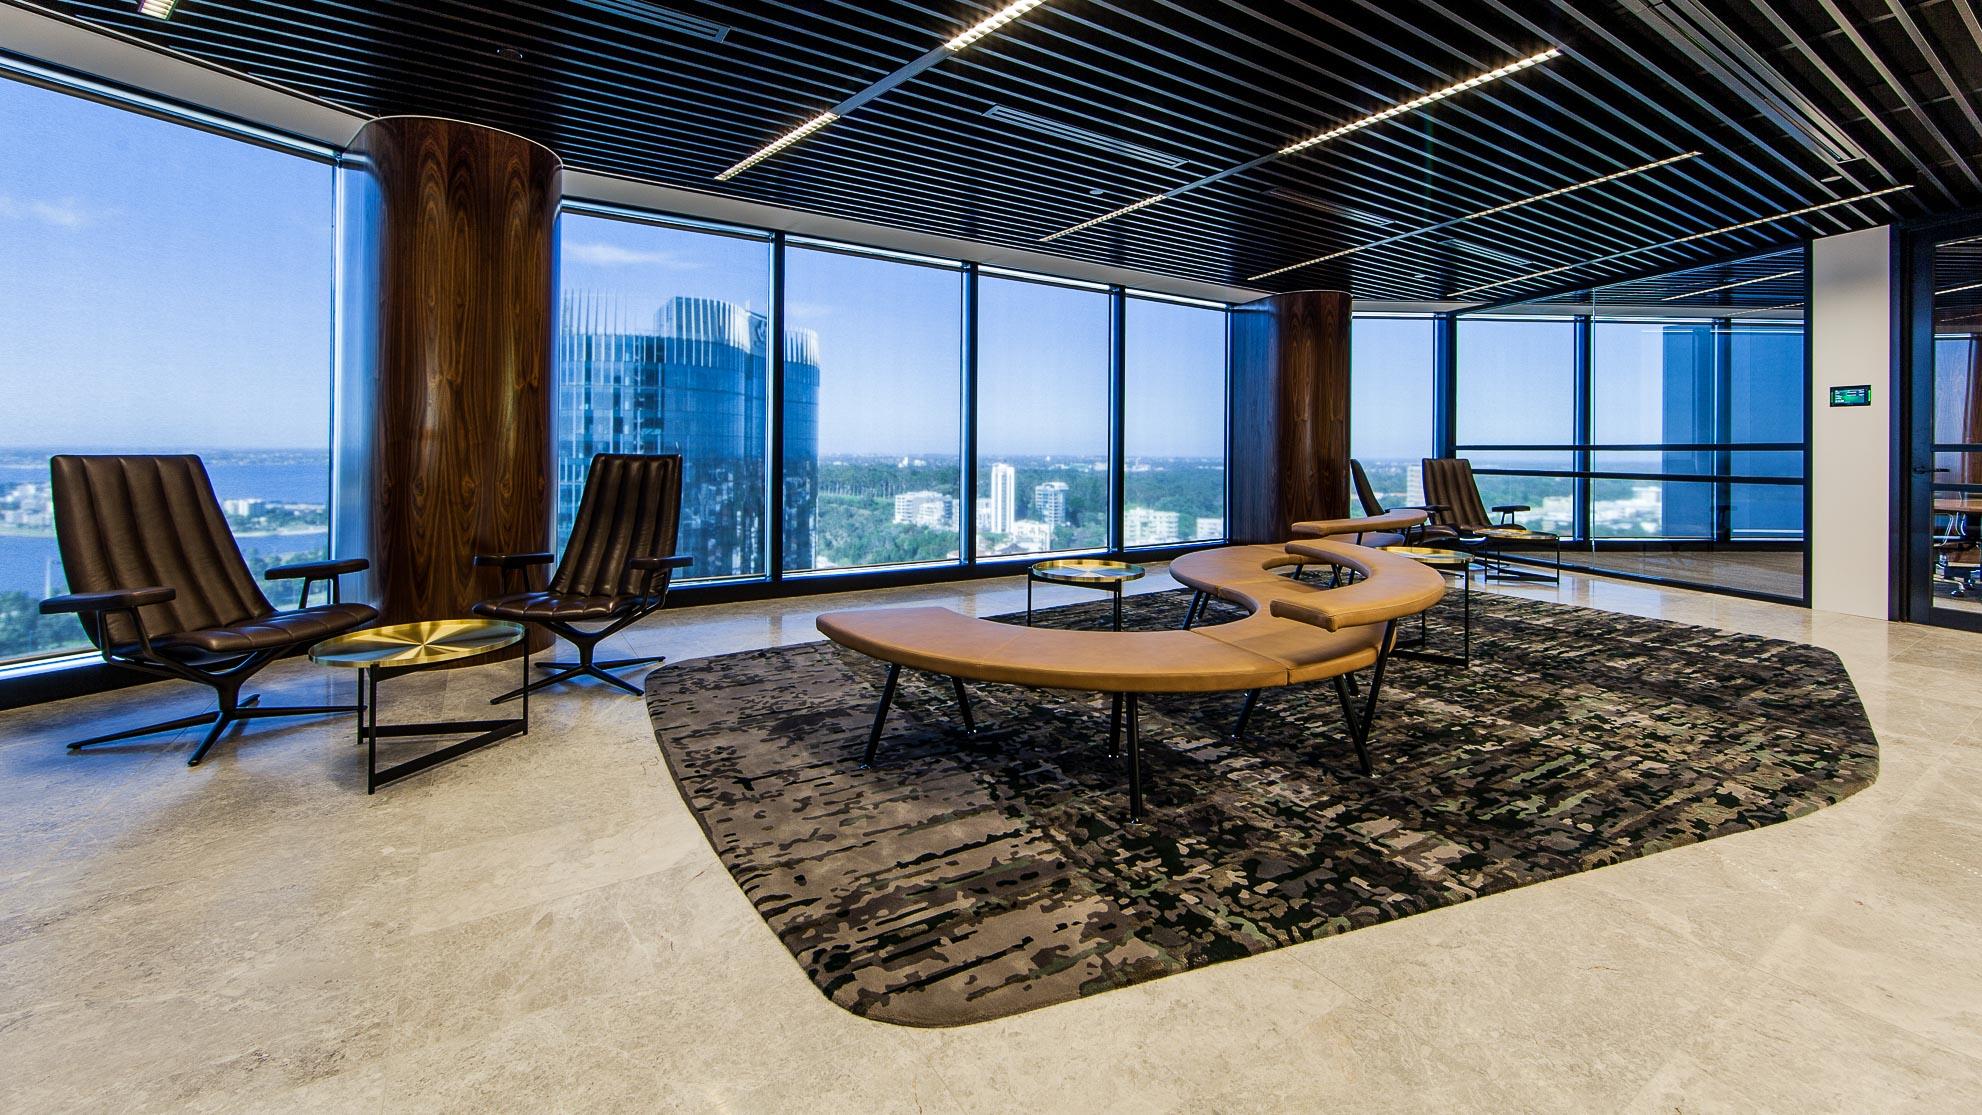 IA Design - Interior Design Architecture - CBRE Headquarters